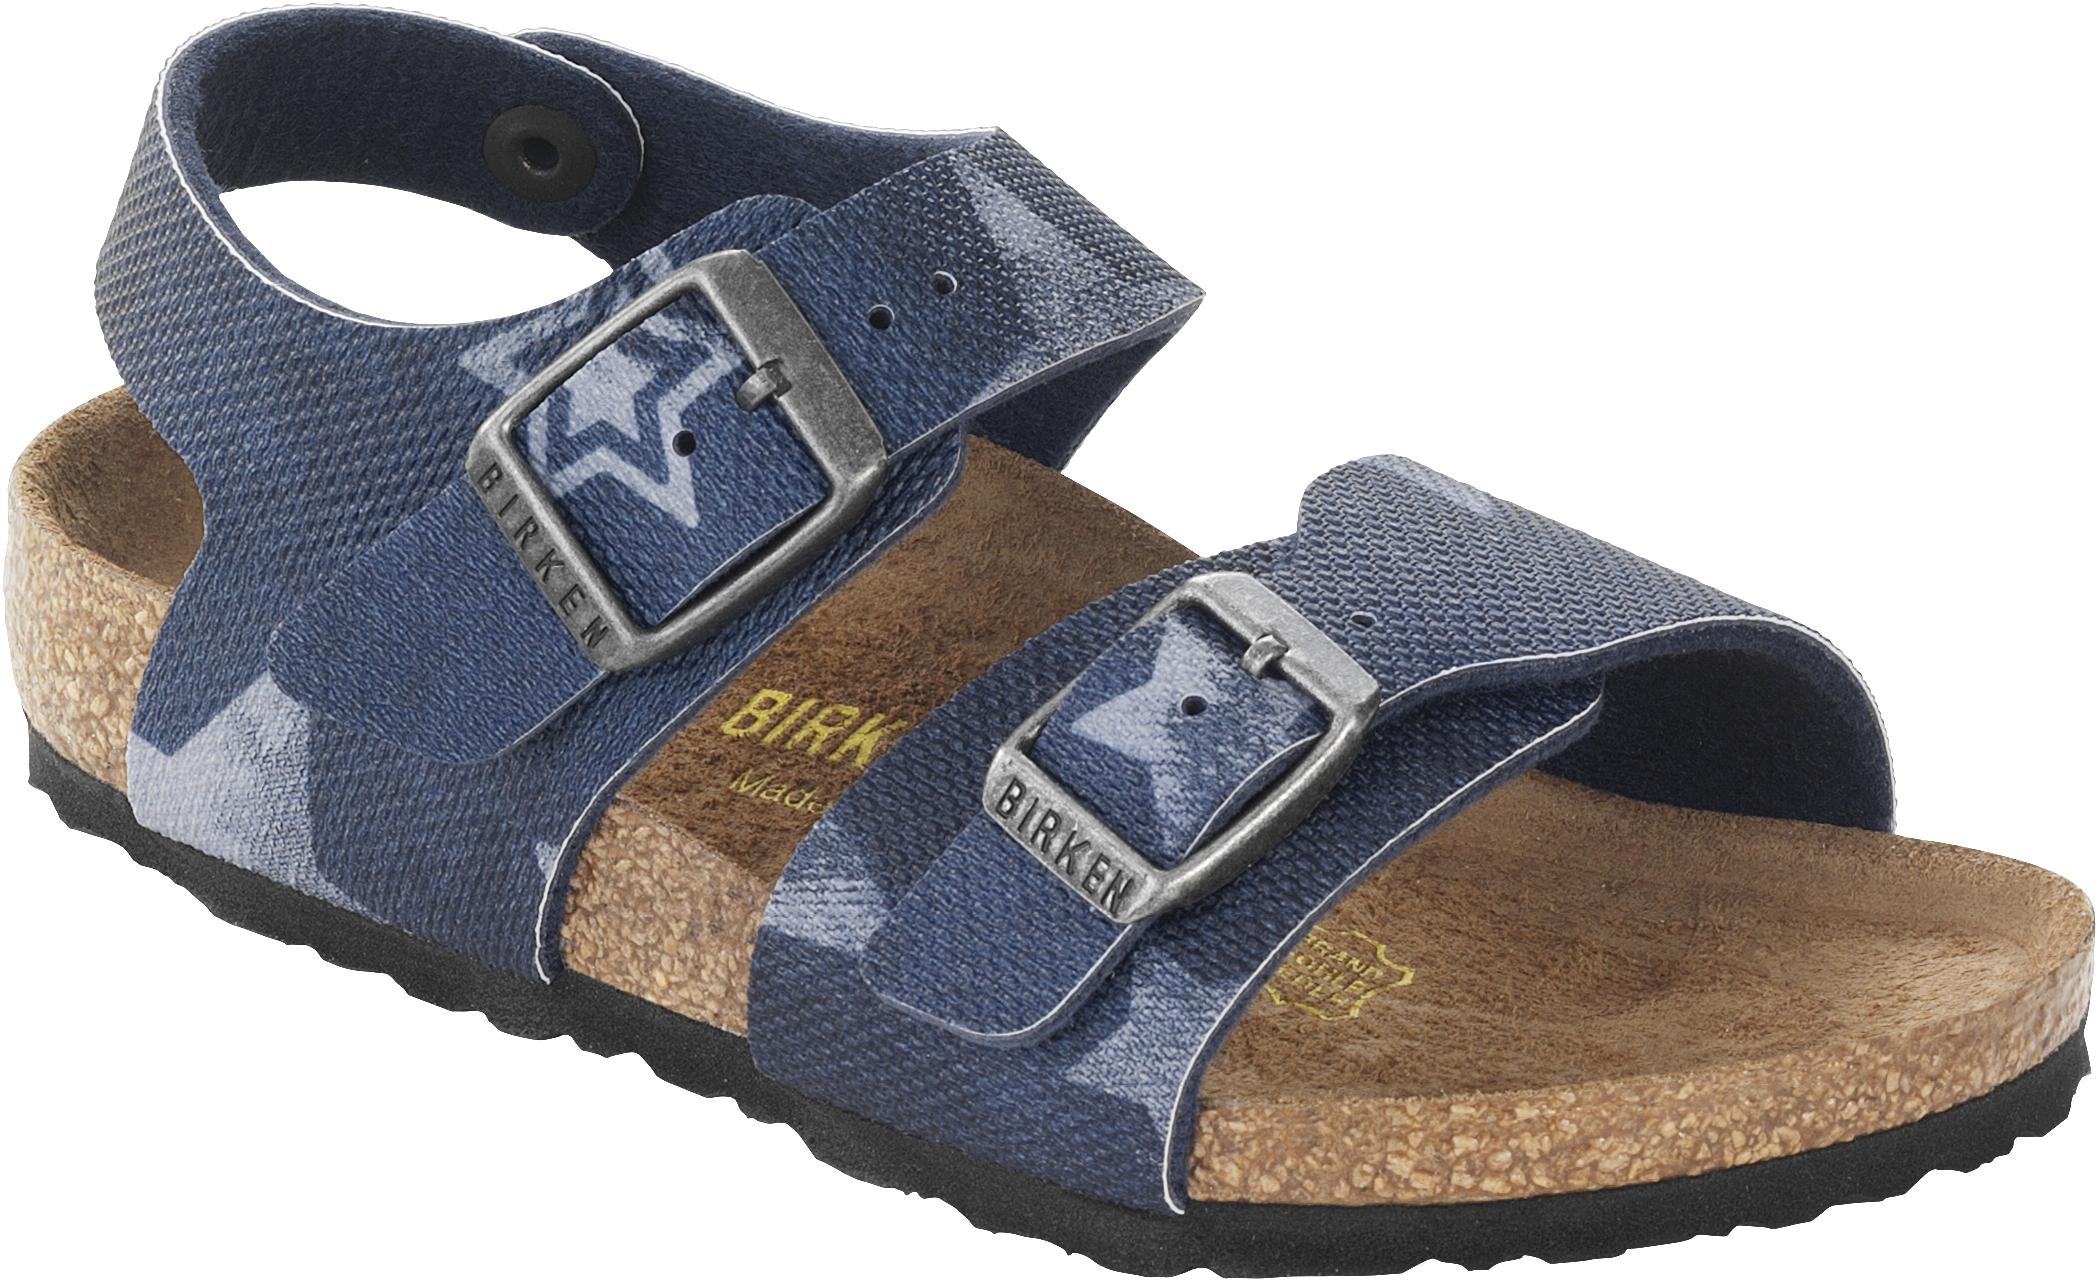 71e14f223c28d8 Birkenstock Sandale New York kids BS vintage stars blue Gr. 24 - 34 089383K